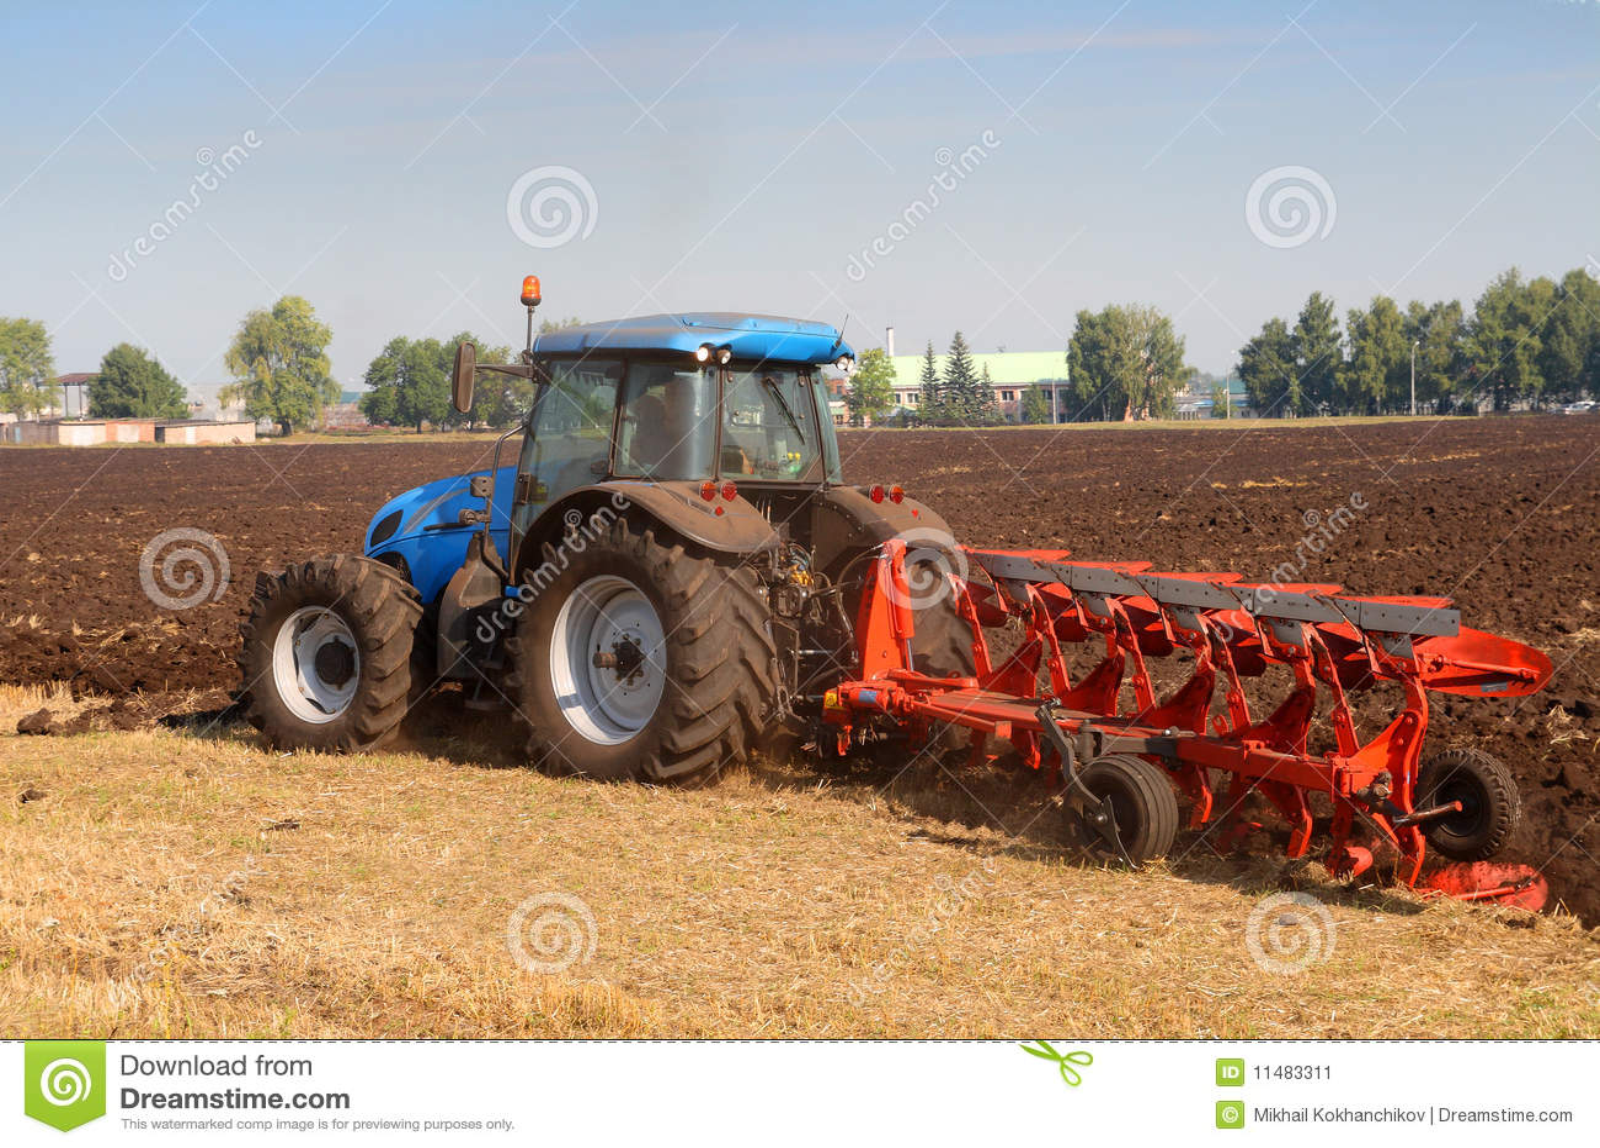 traktor mit pflug stockbild bild von stubble herbst 11483311. Black Bedroom Furniture Sets. Home Design Ideas